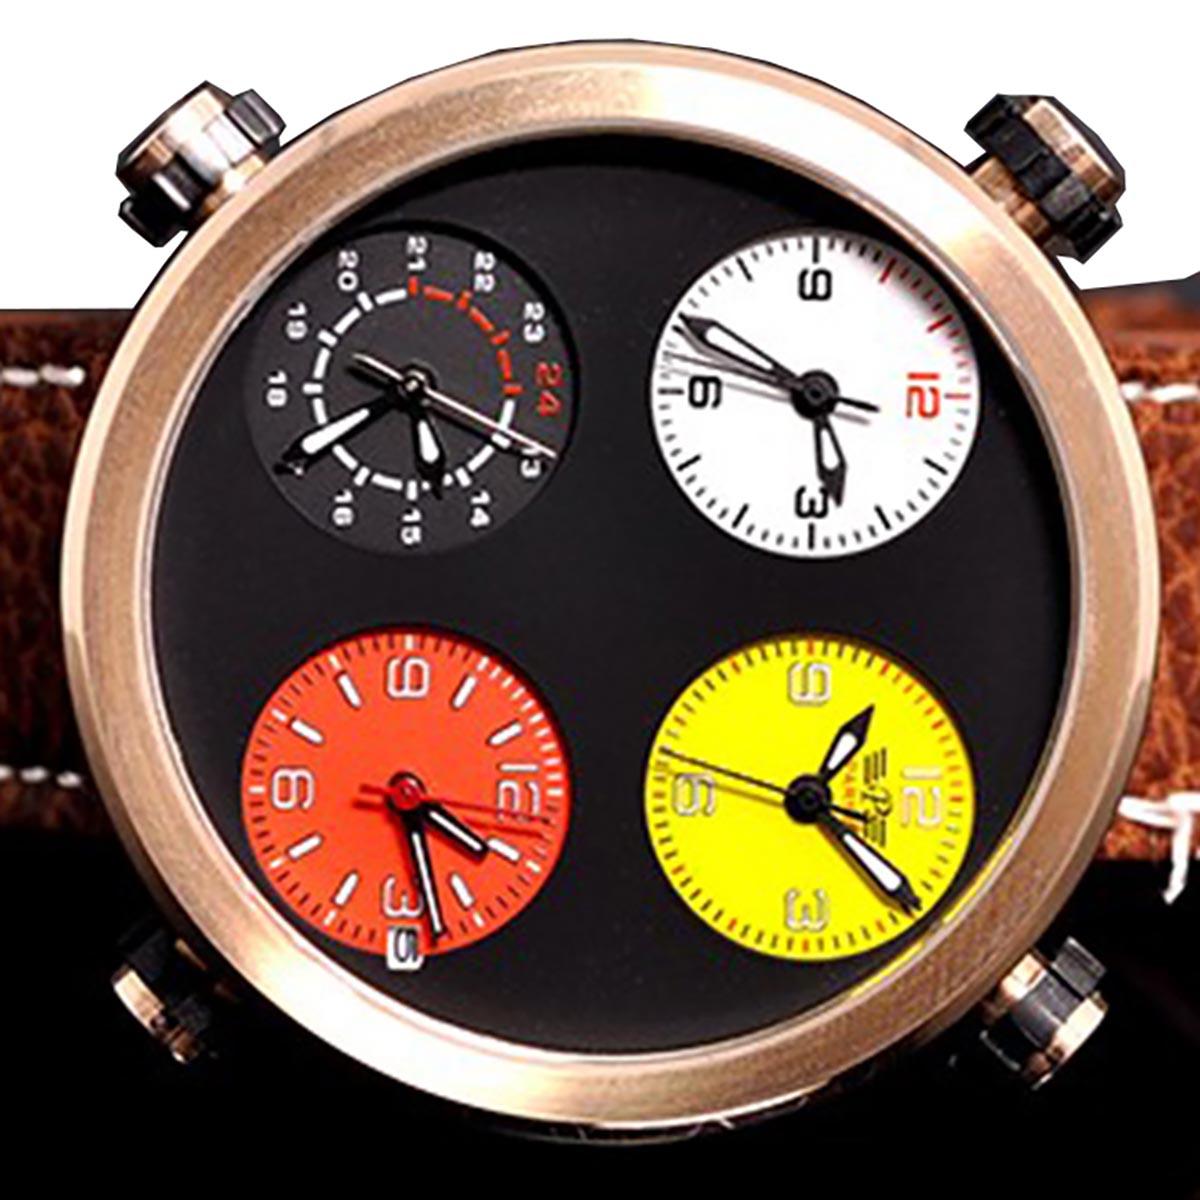 PARNIS パーニス    腕時計 メンズ [pn-523g12el] 並行輸入品 当店保証24ヵ月 メンズウォッチ 海外 ブランド 腕時計